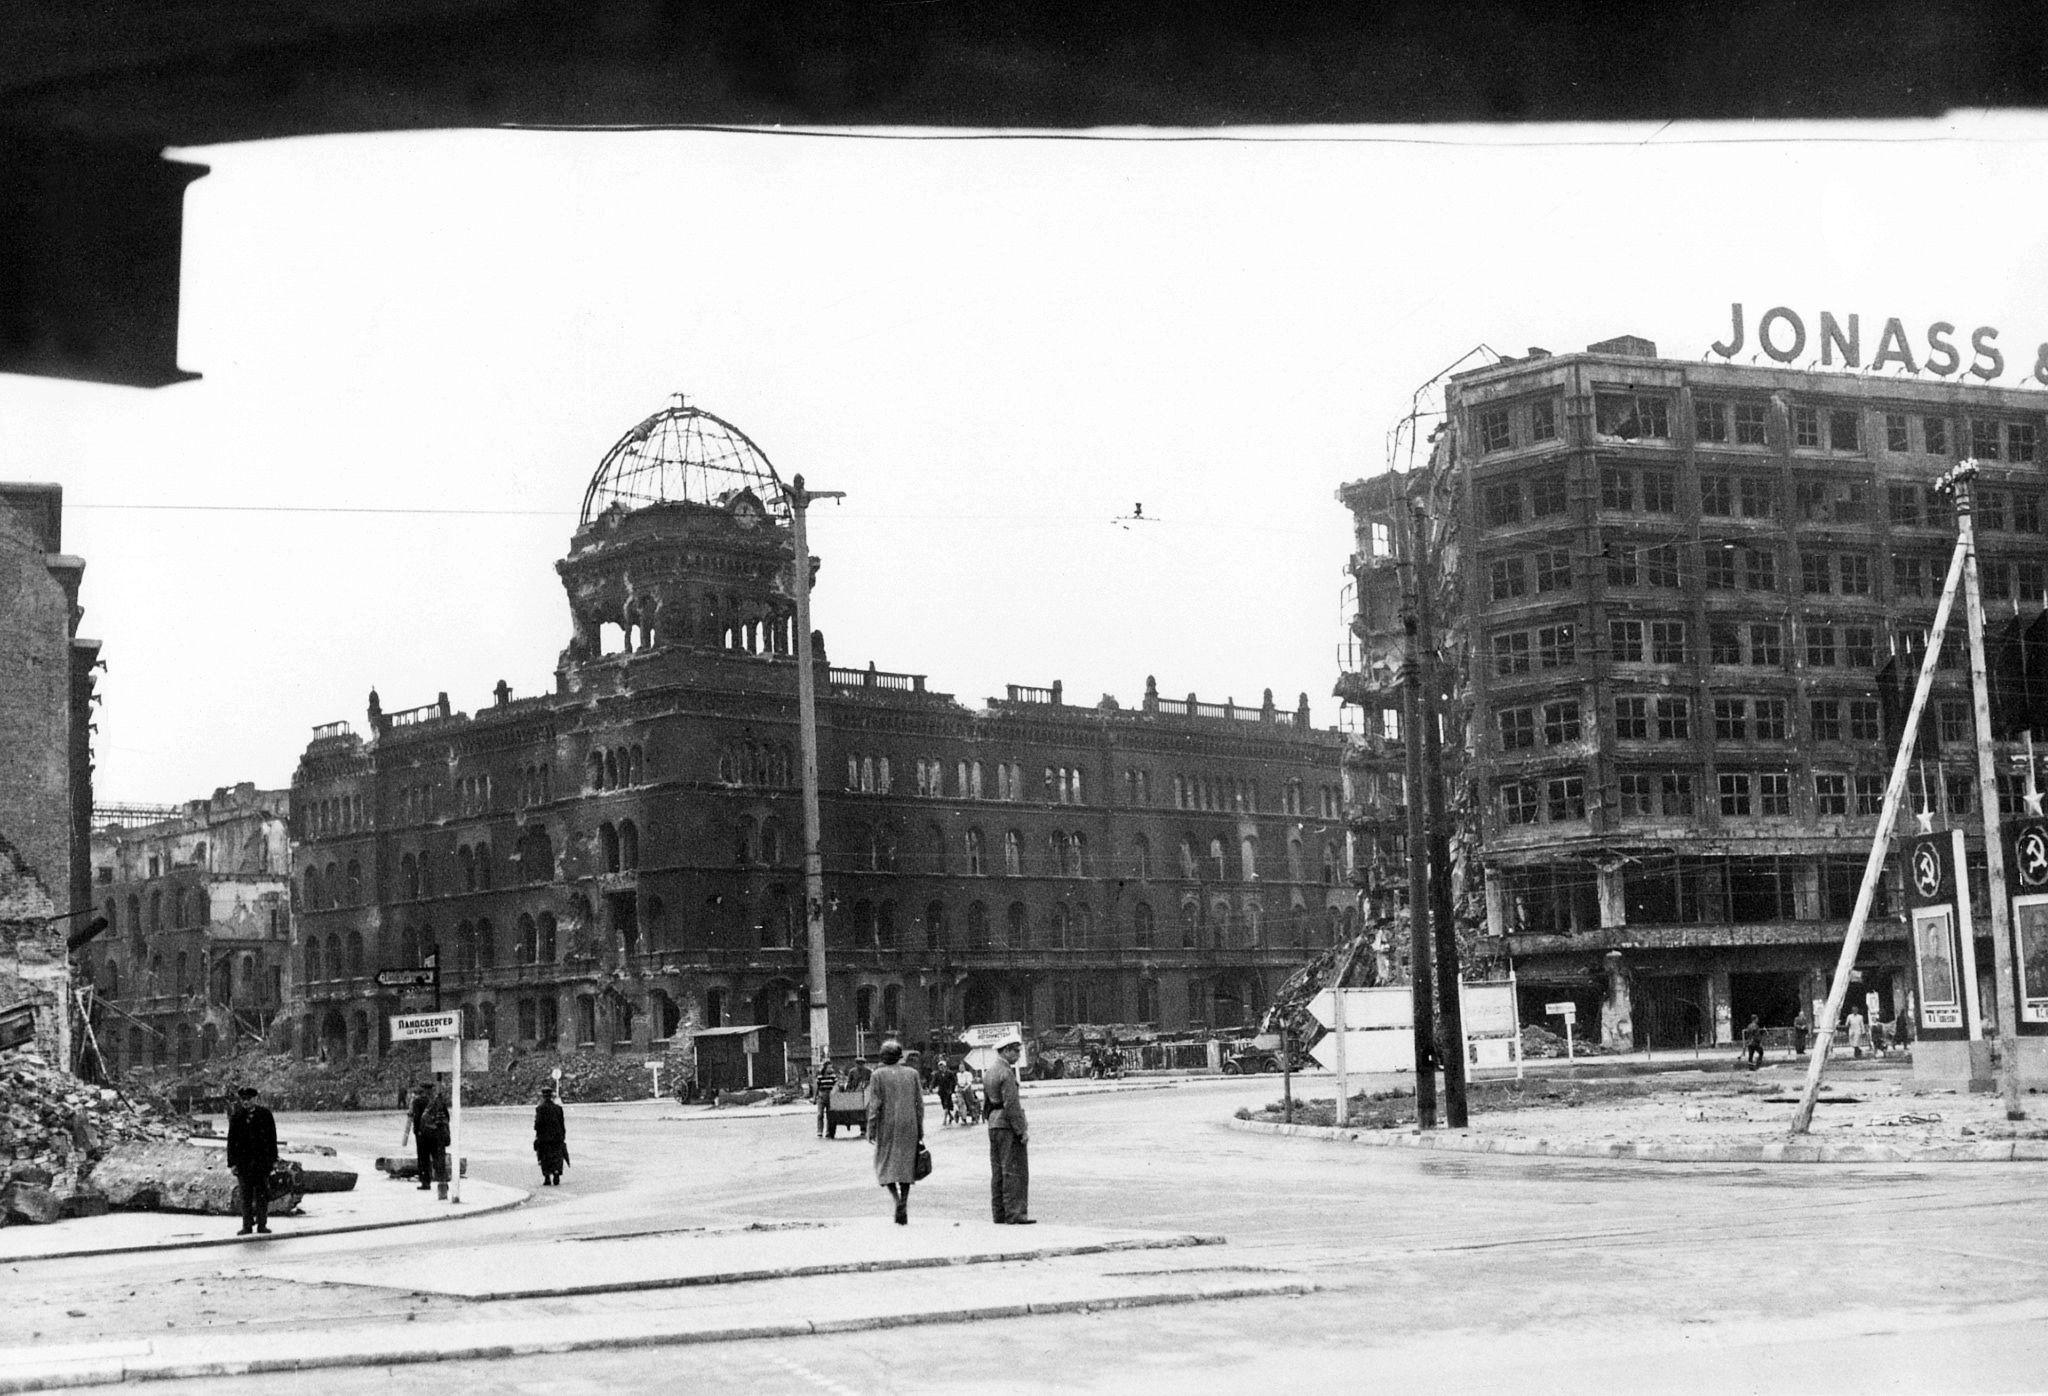 1945 Berlin Alexanderplatz Landsbergerstr Ecke Neue Konigstr Rote Burg Alexander Haus Gettyimages Co Uk In 2020 Berlin City Germany